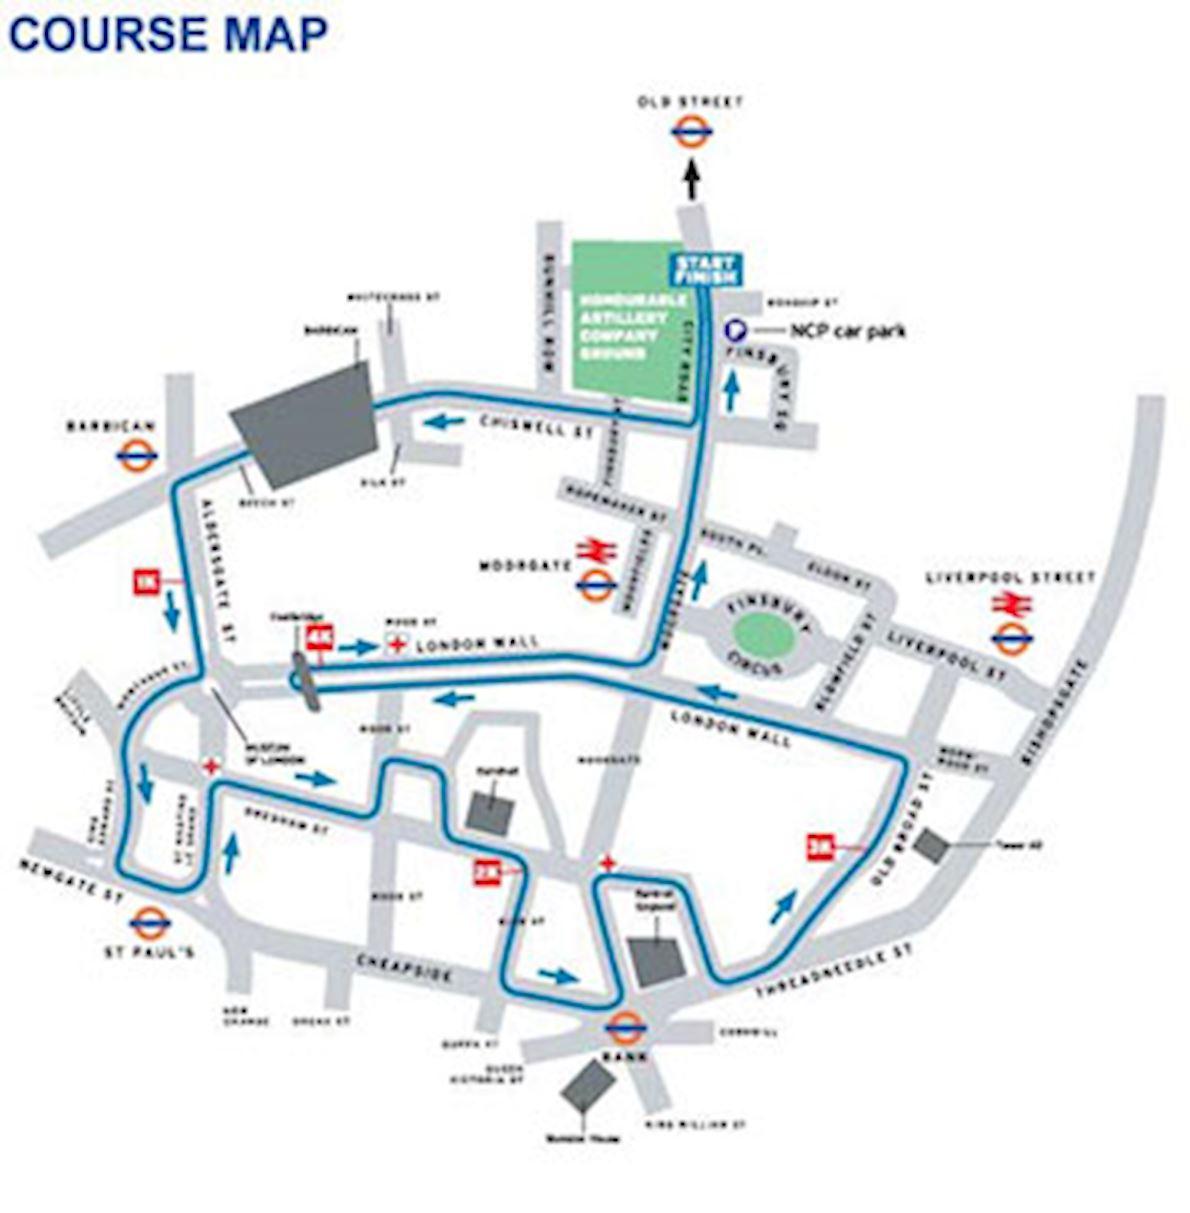 Standard Chartered Great City Race Mappa del percorso